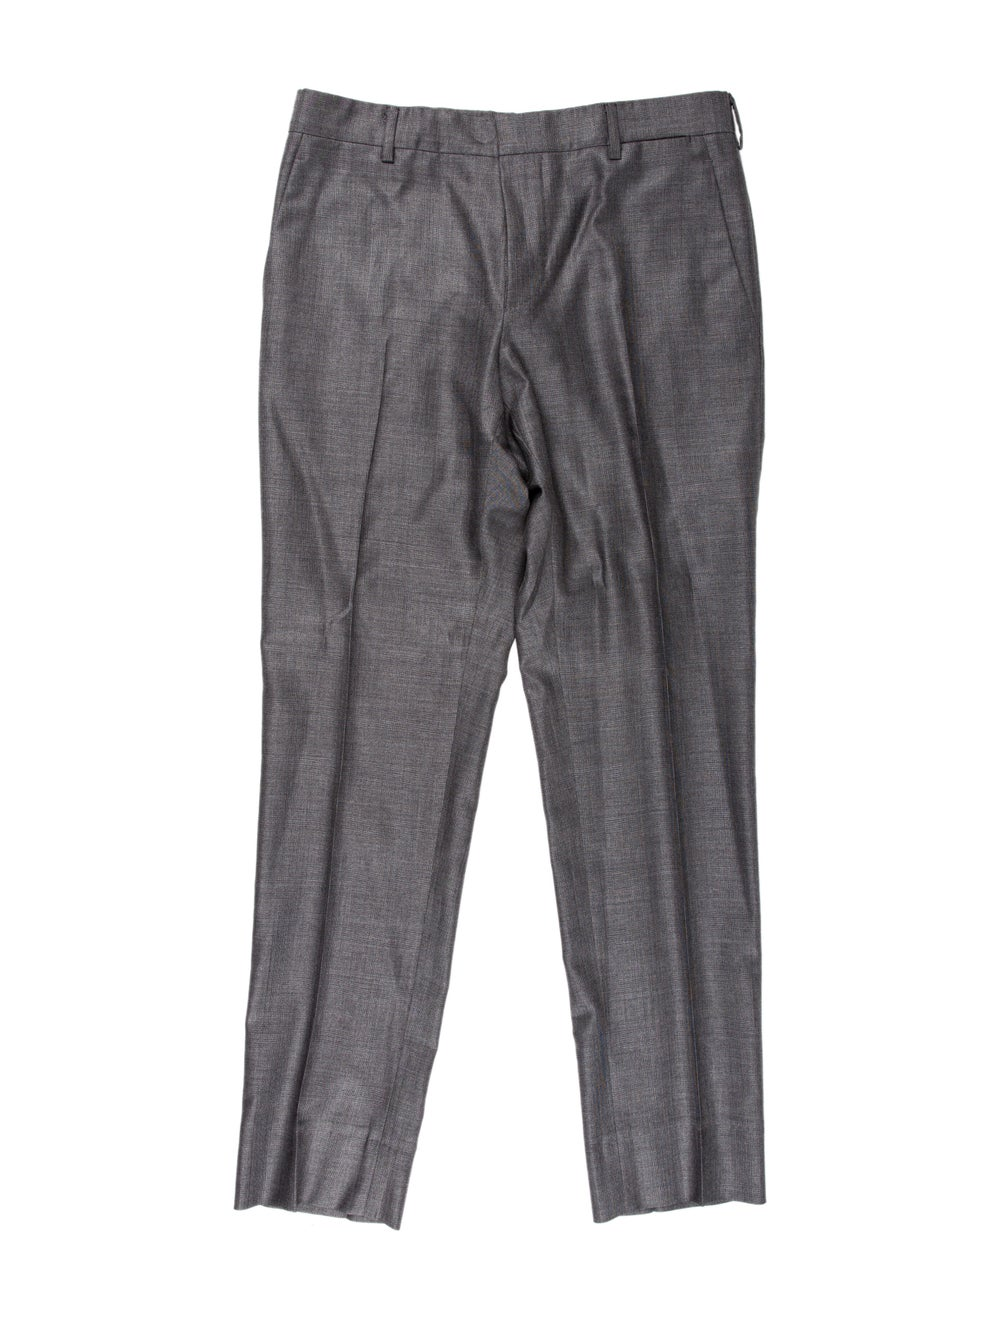 Prada Wool-Blend Two-Piece Suit grey - image 3